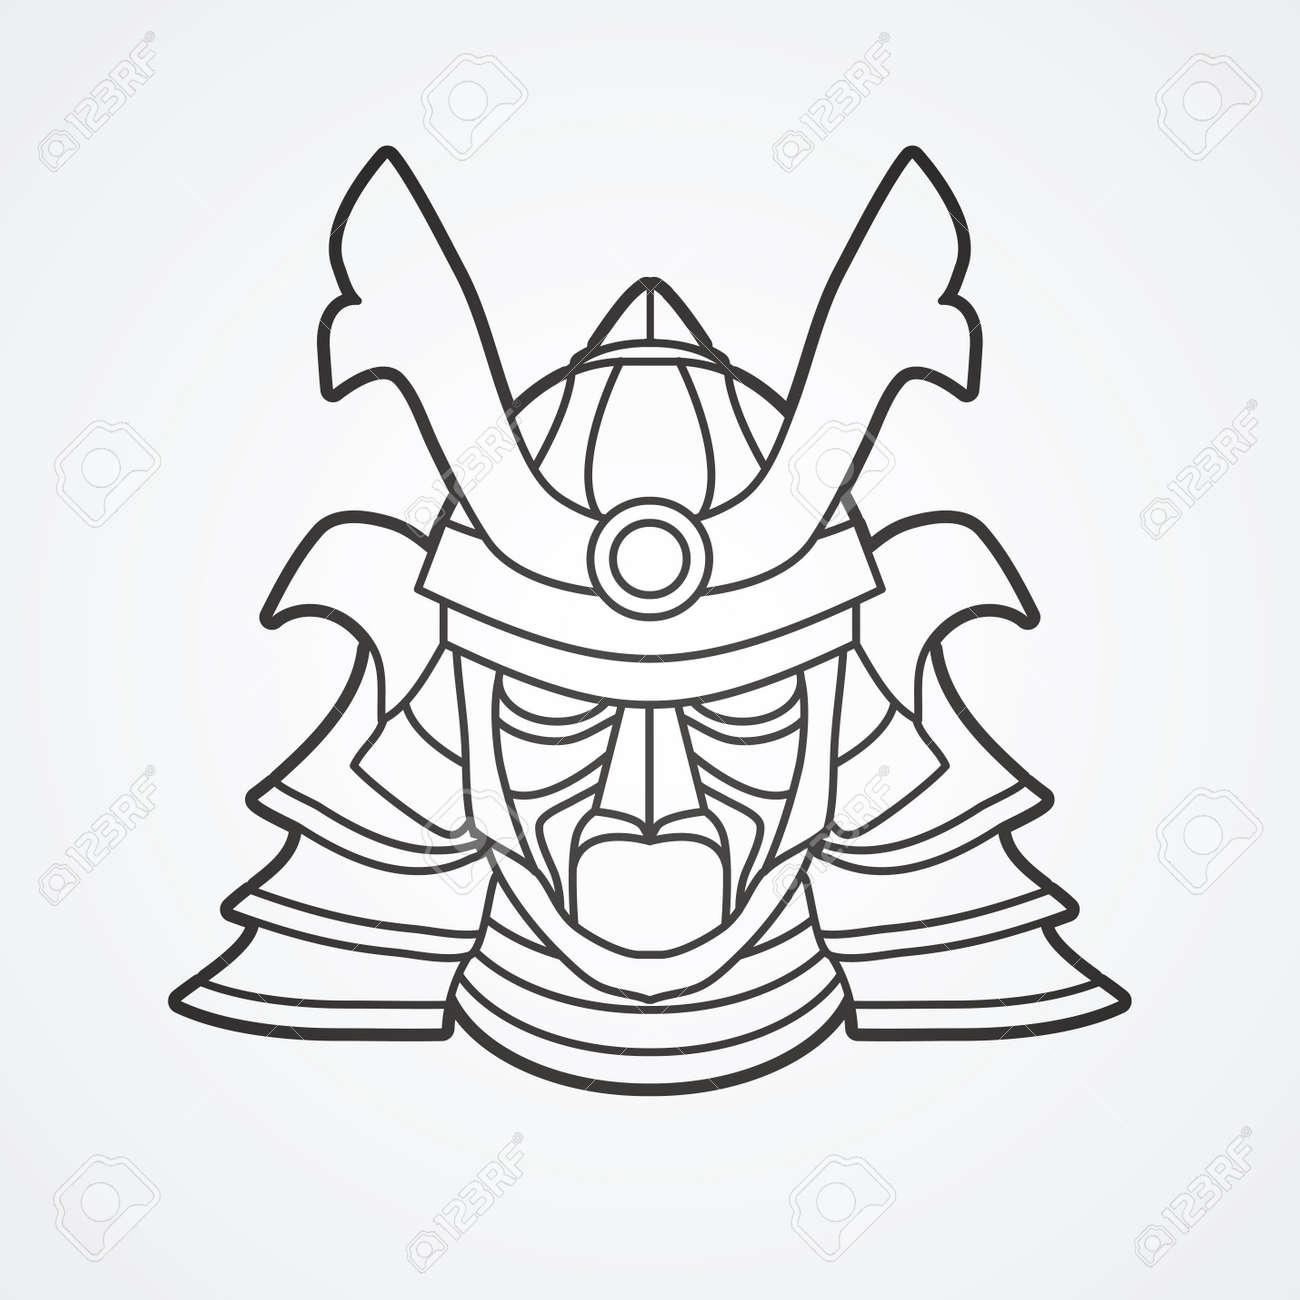 Lujo Guardas Samurai Para Colorear Bosquejo - Dibujos Para Colorear ...